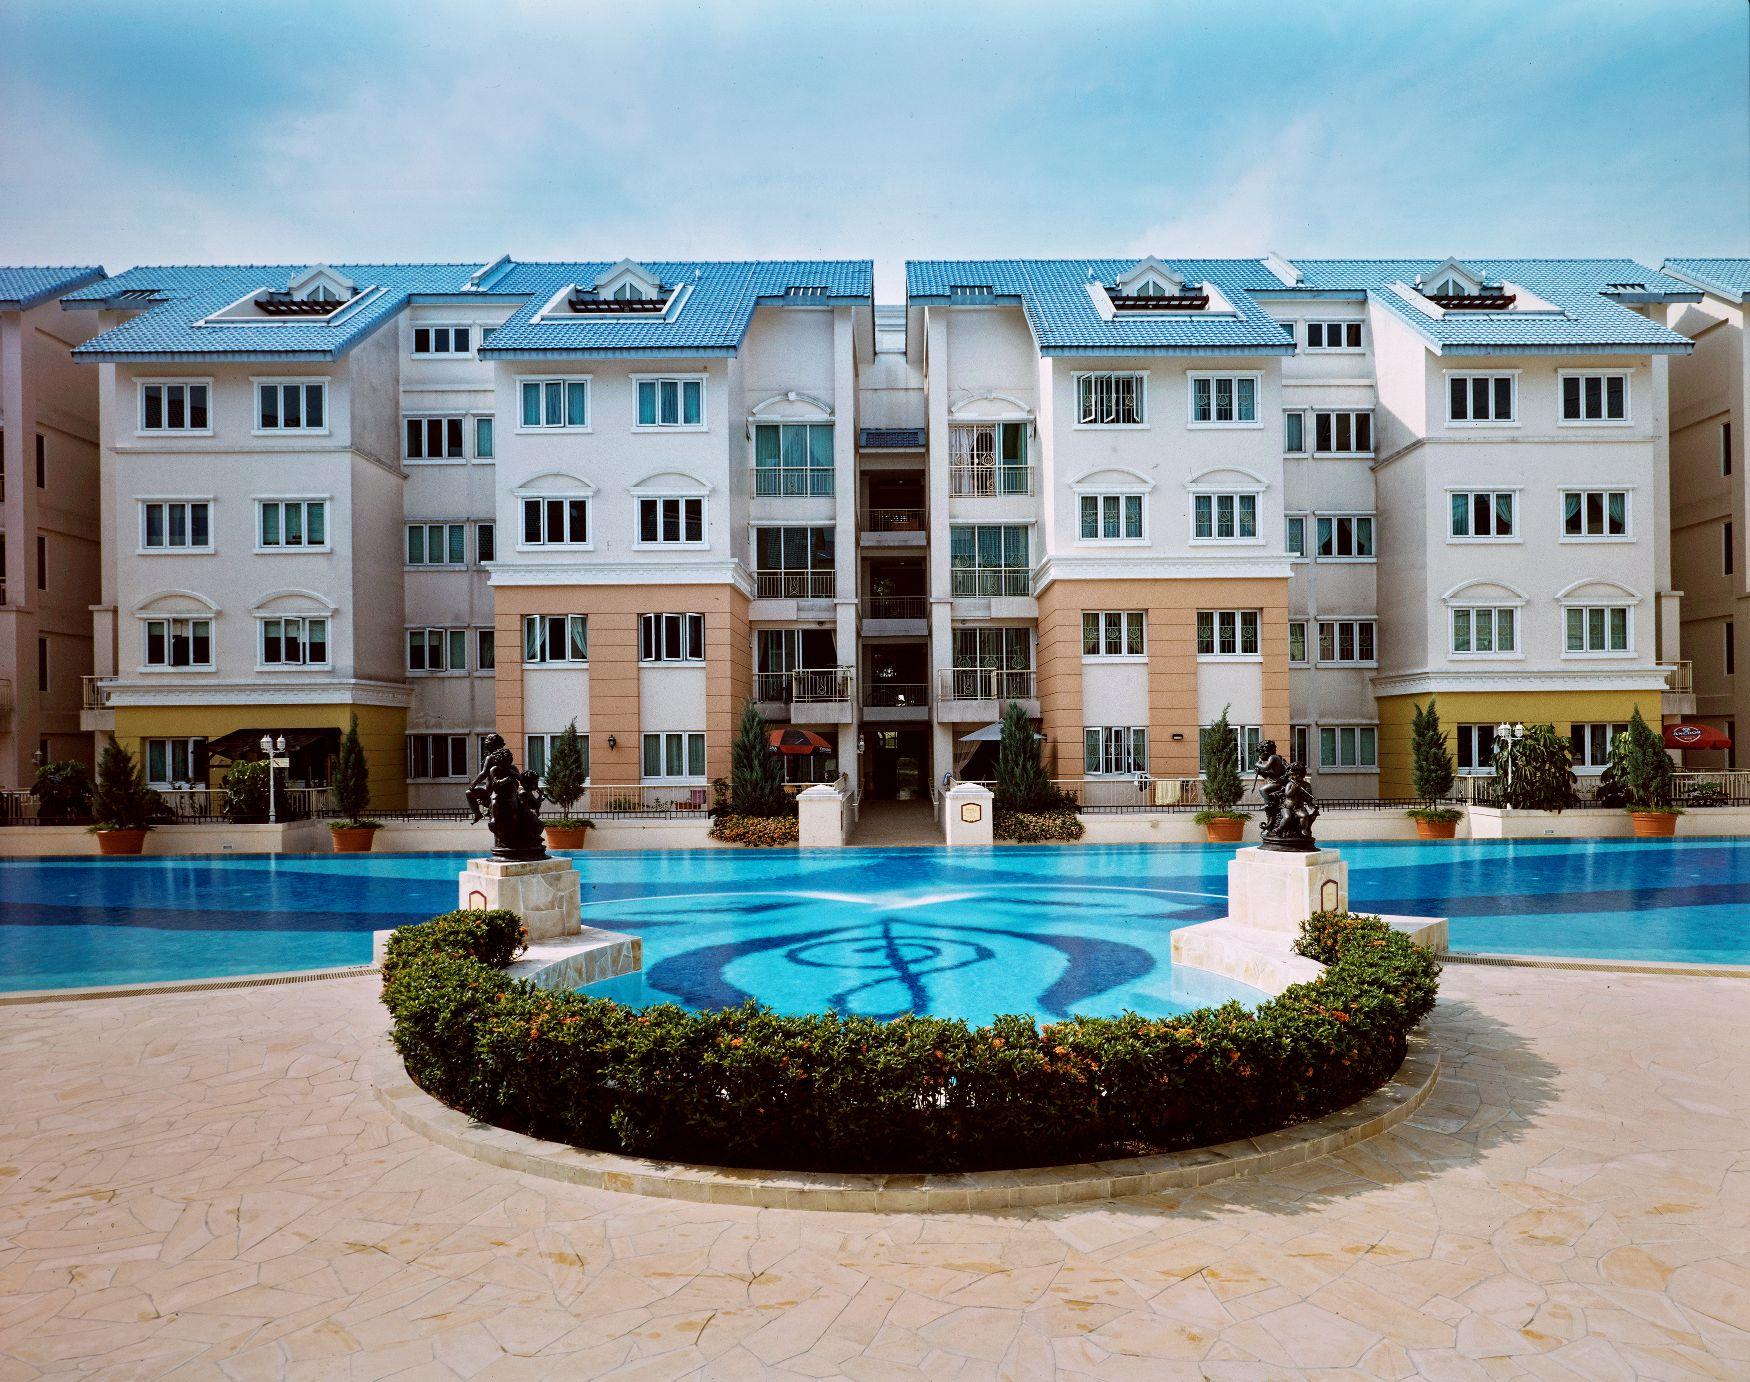 Euphony Gardens Condominium